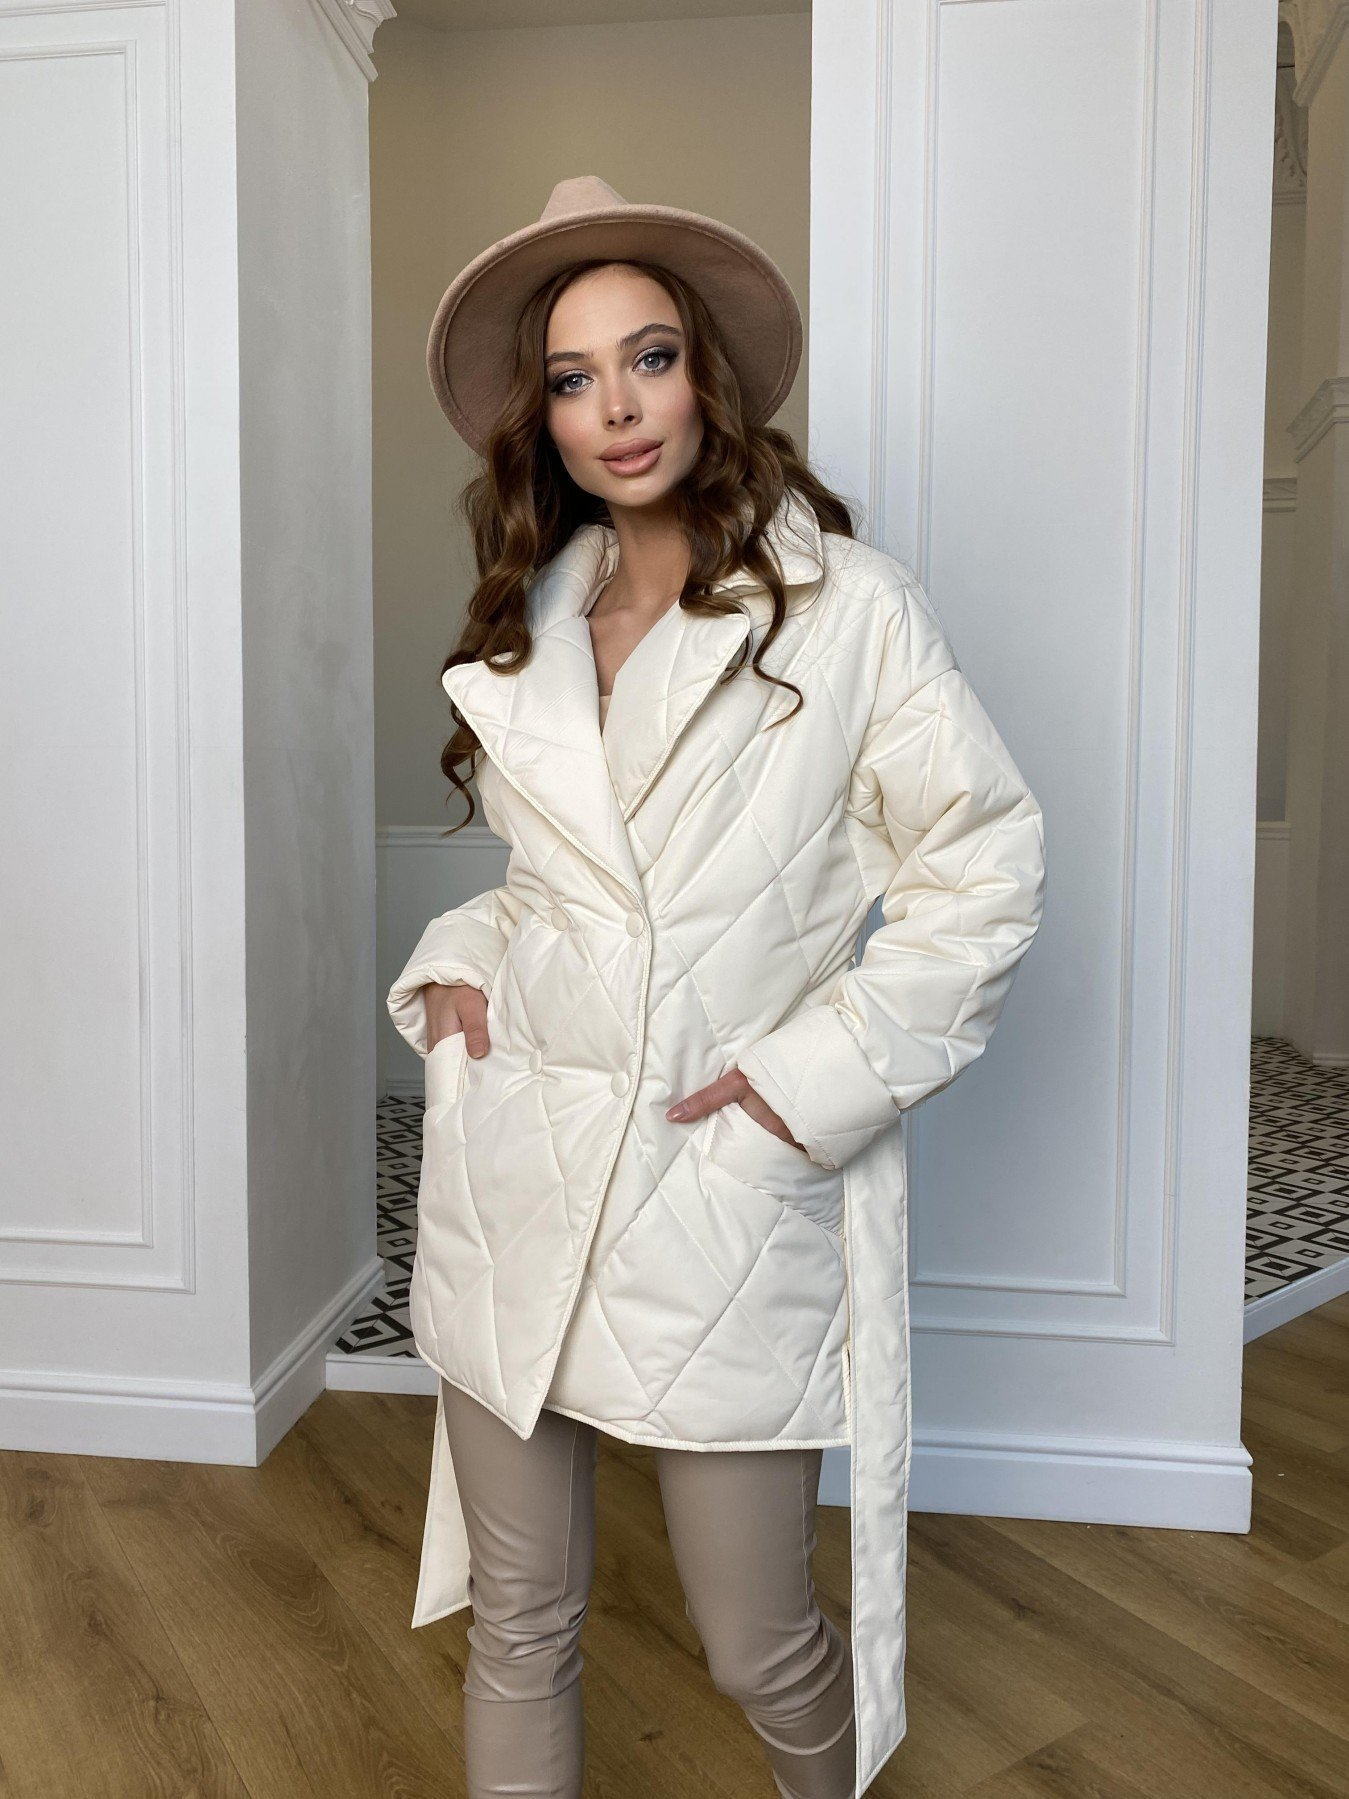 Норд Бат стеганая куртка из плащевки Ammy  10947 АРТ. 47435 Цвет: Молоко - фото 6, интернет магазин tm-modus.ru